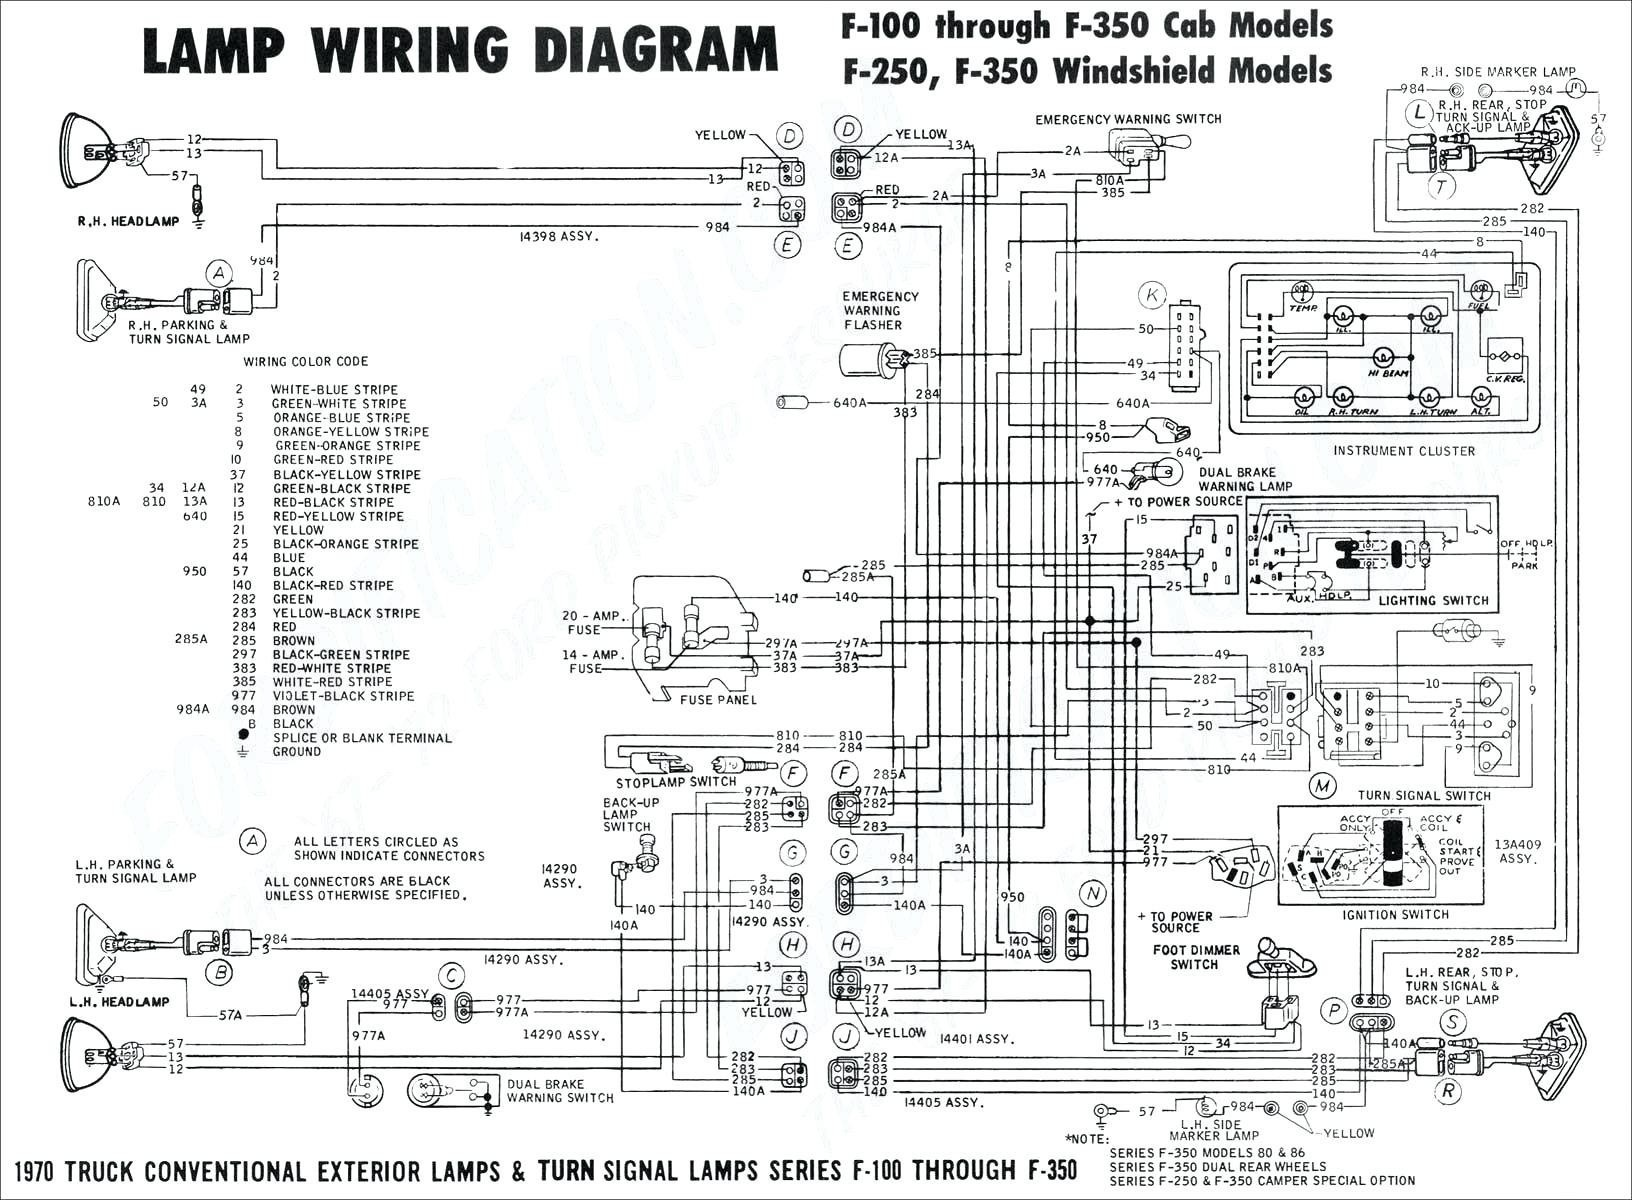 2000 f250 headlight switch wiring diagram wiring diagram au falcon fresh stop turn tail light wiring diagram beautiful 1979 ford f150 tail 17t